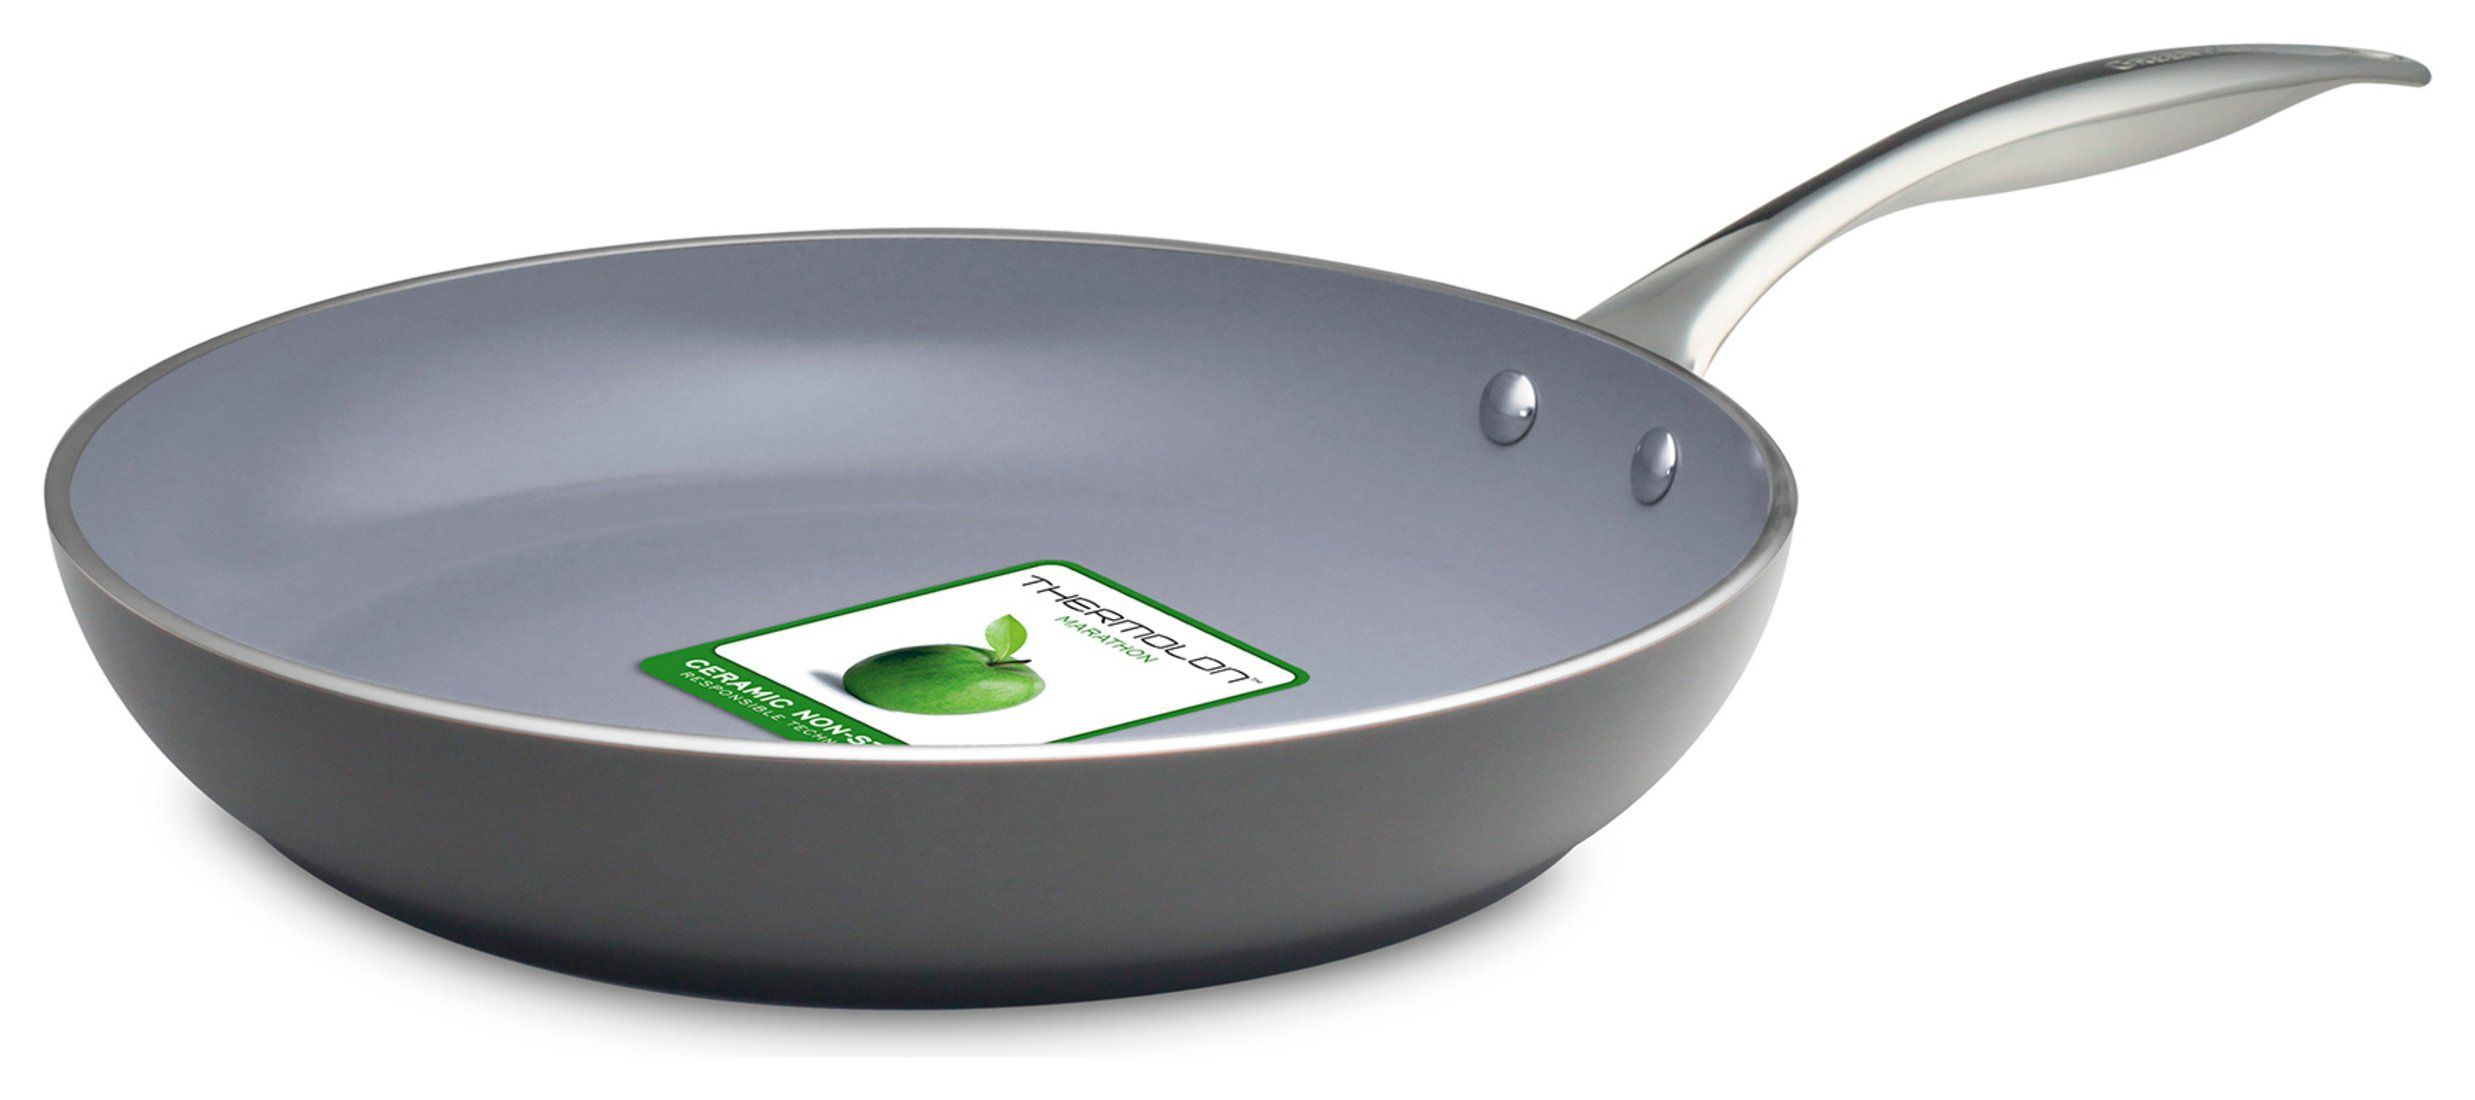 Image of GreenPan Venice 30cm Open Frying Pan